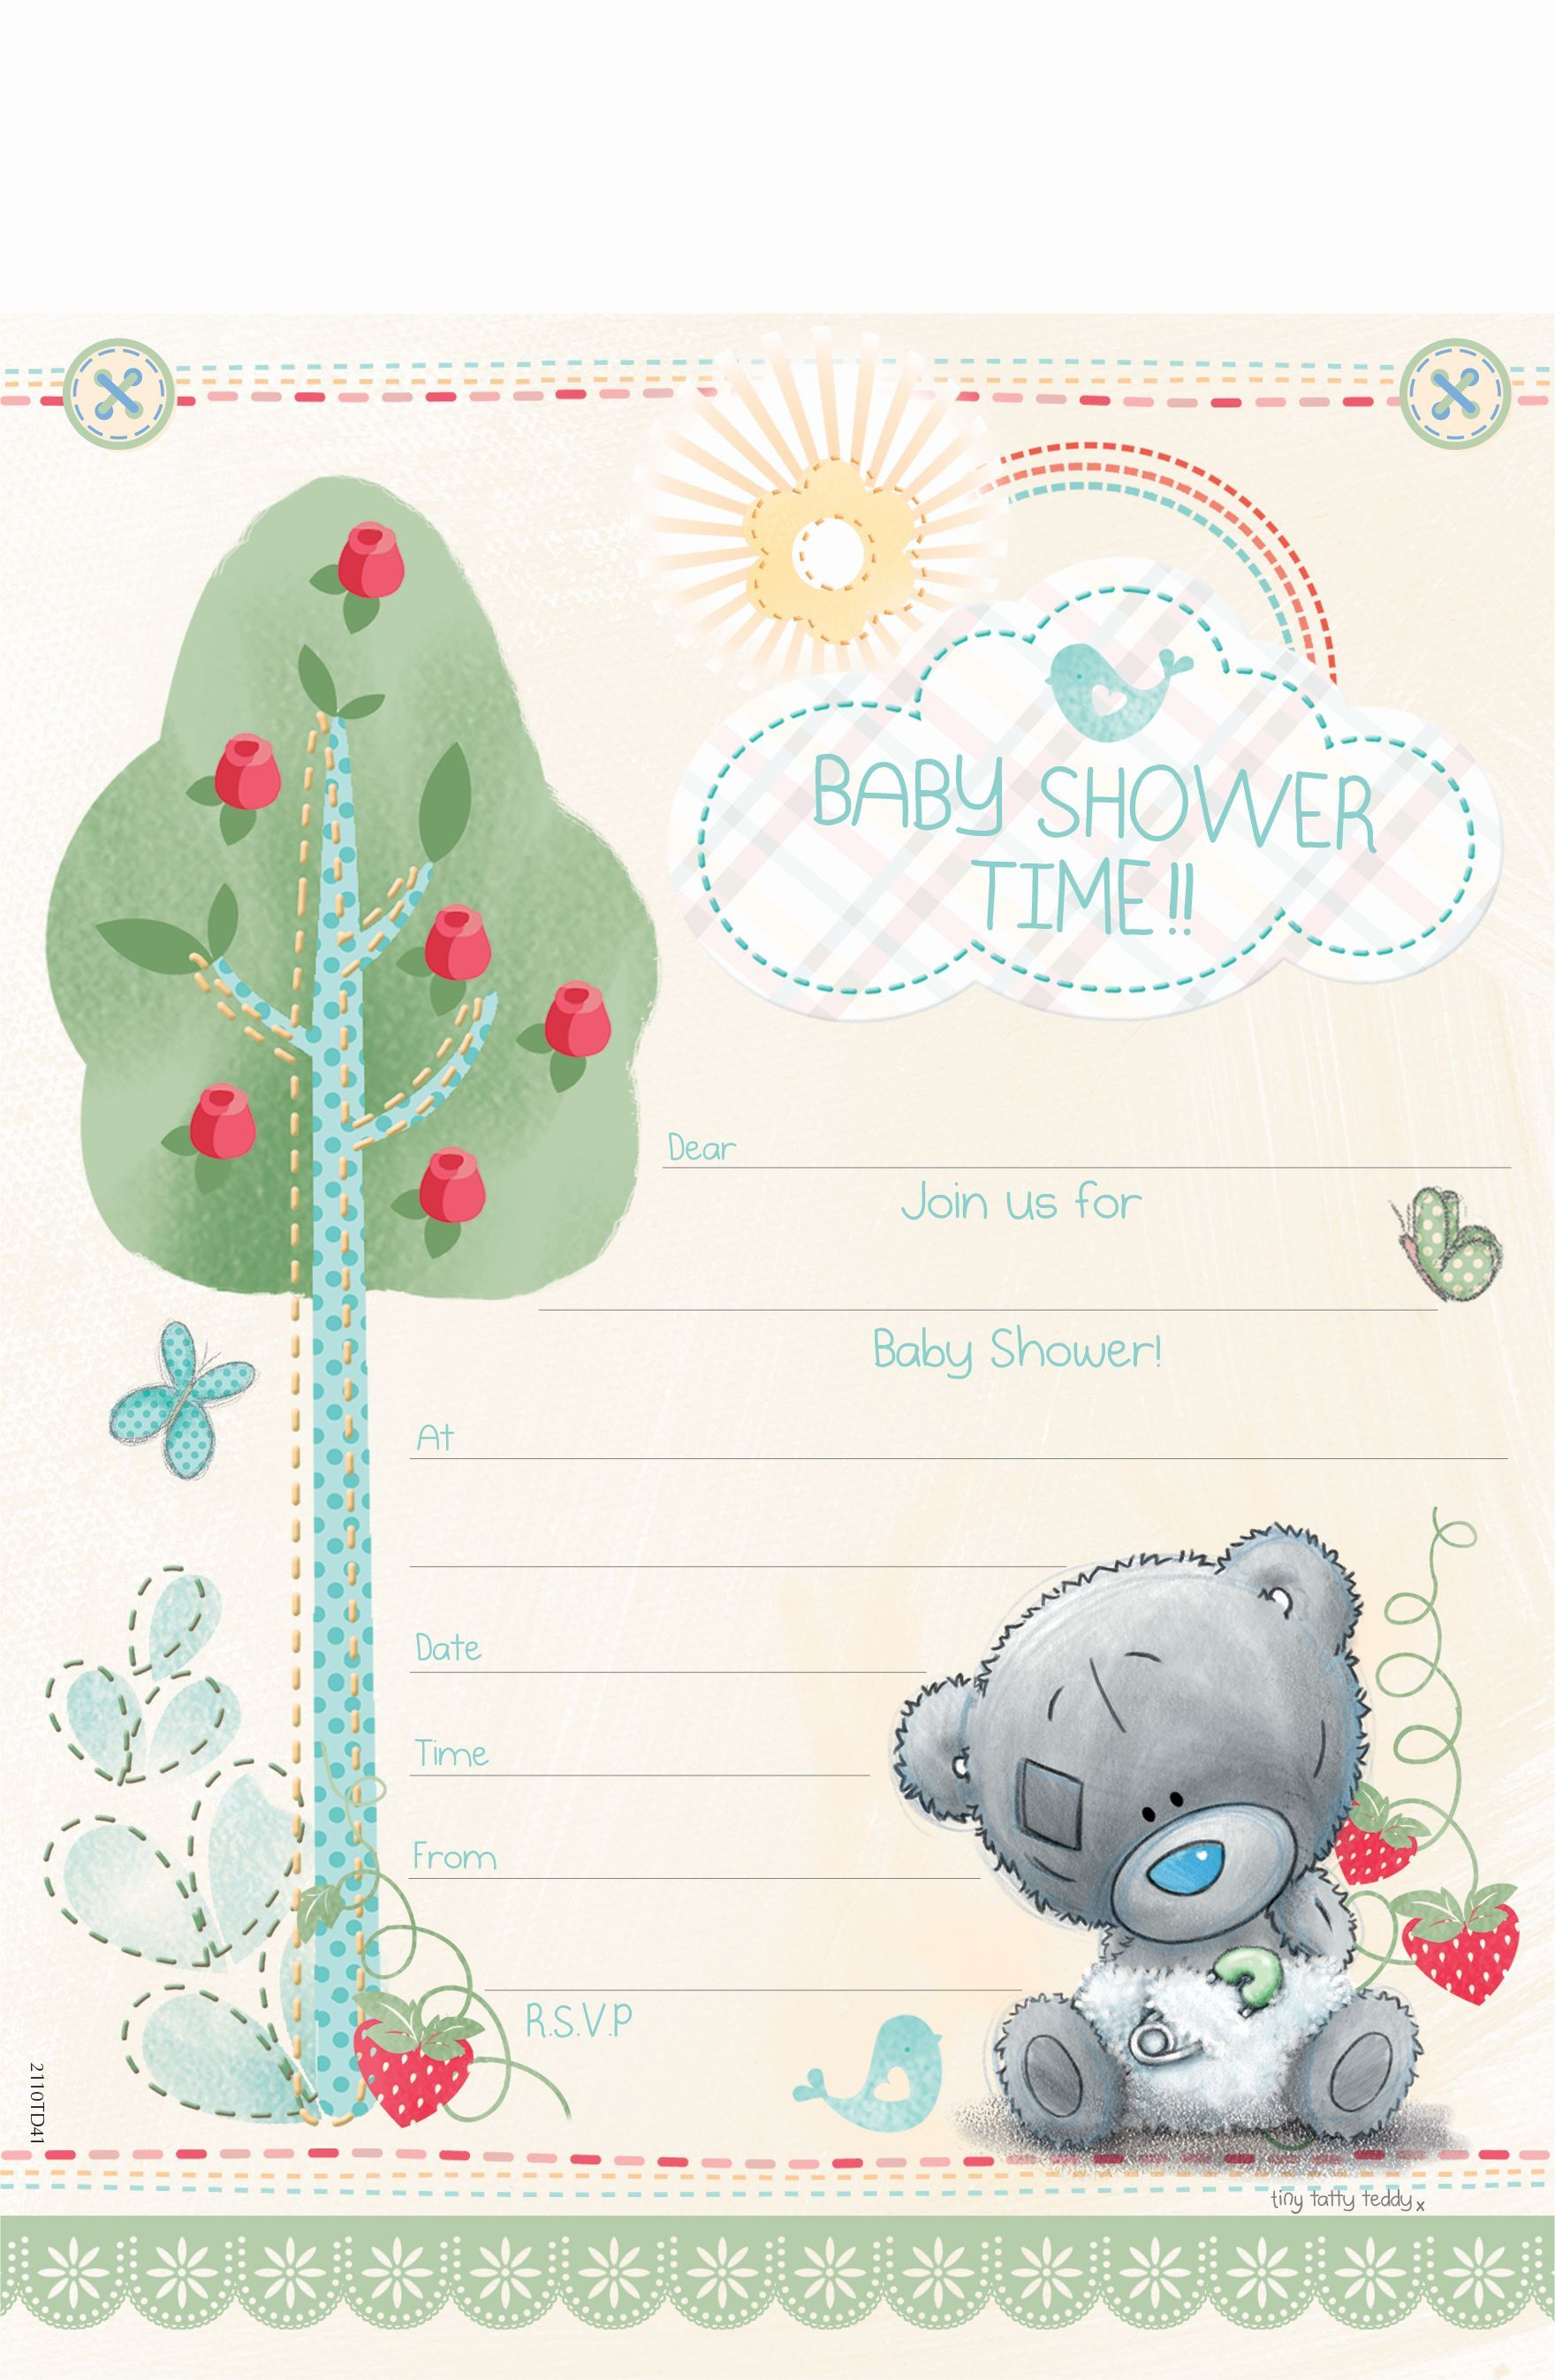 Tattyy Baby Shower Invite Sa Greetings Http Www Sagreetings